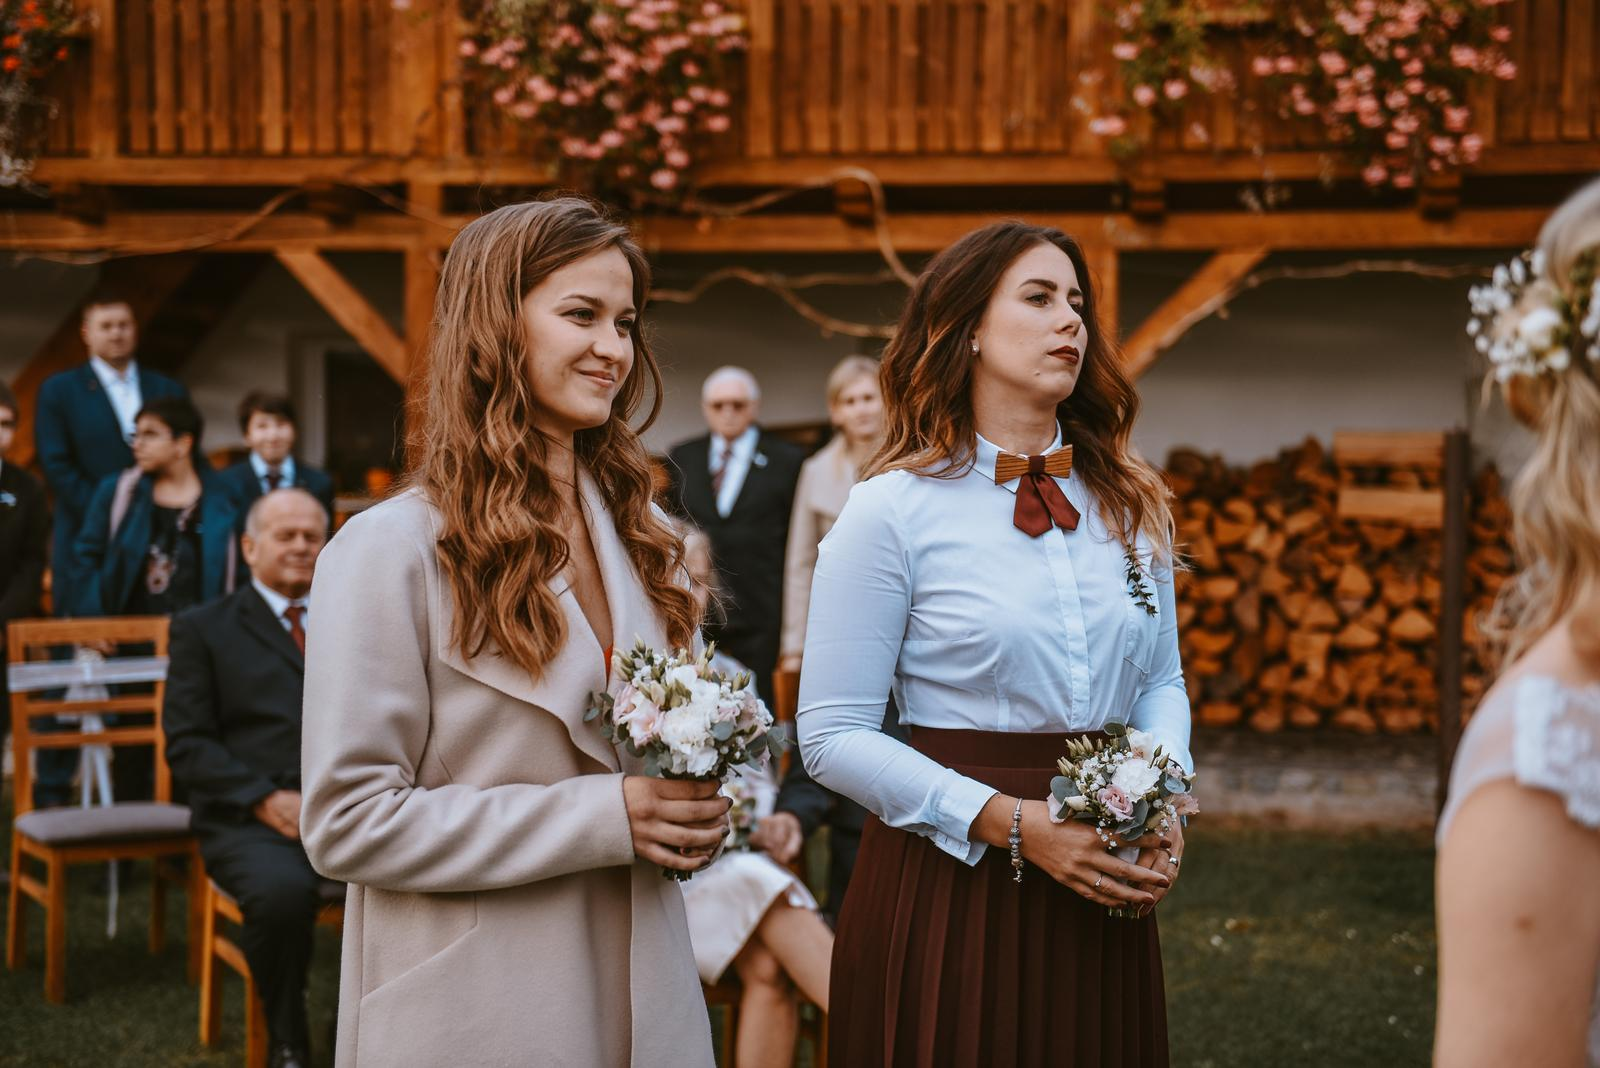 Denisa&Michal - Obrázek č. 49